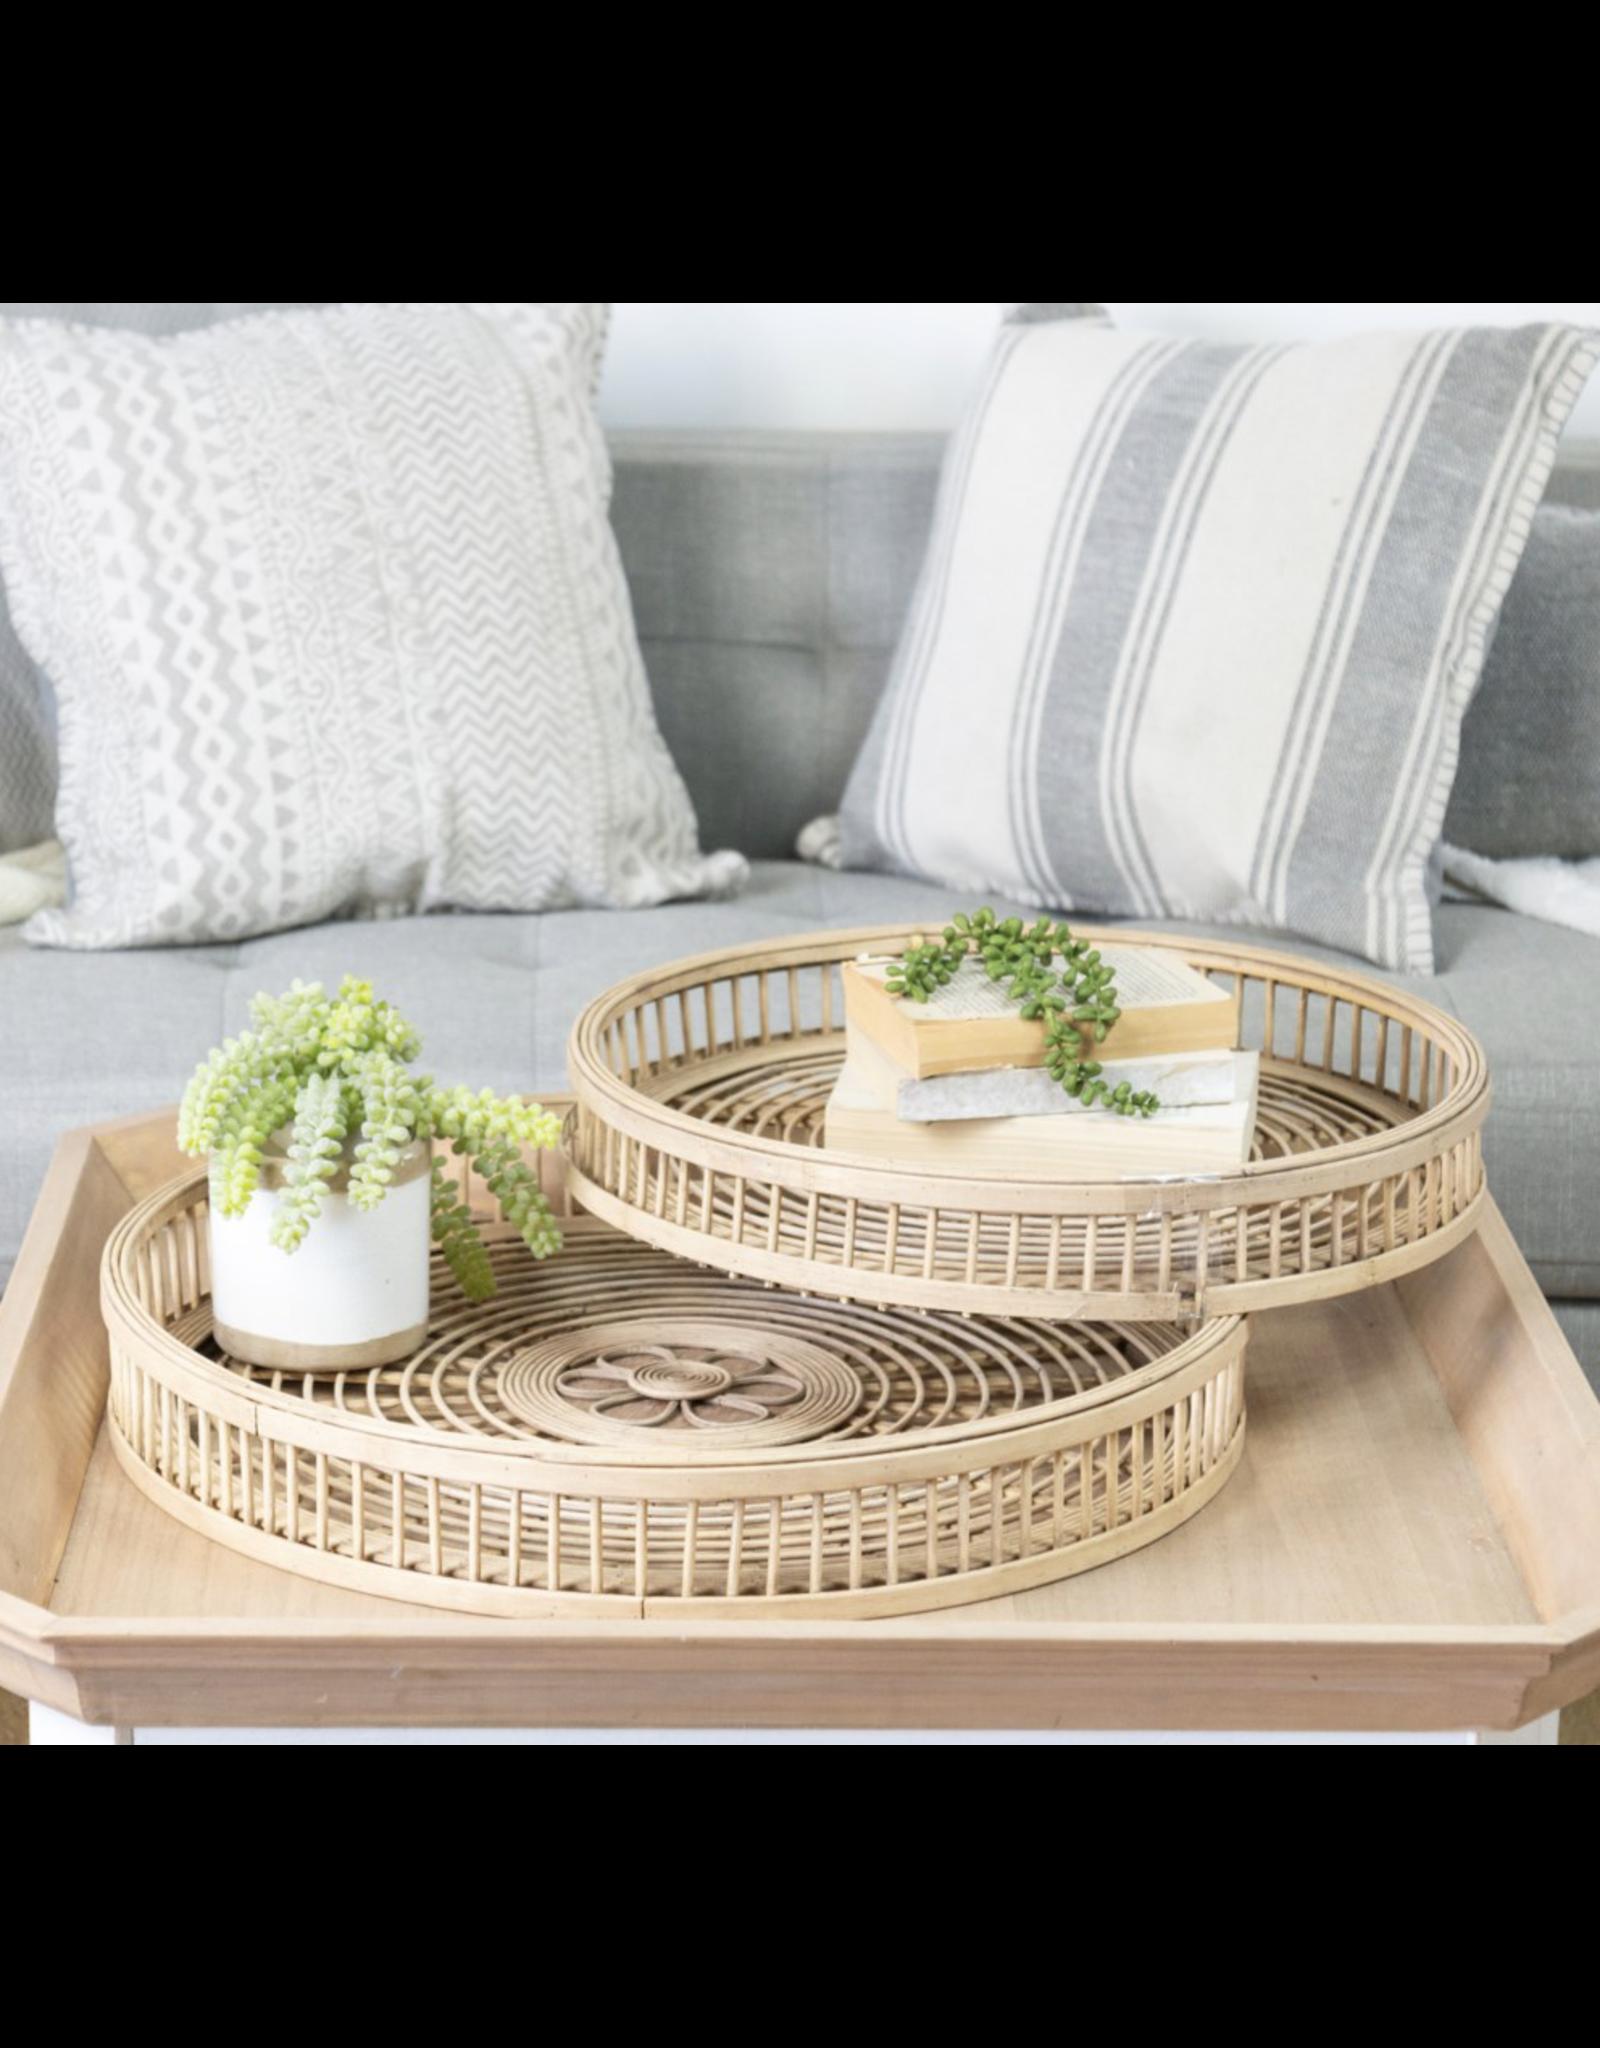 VIP Home & Garden Rattan Tray Small